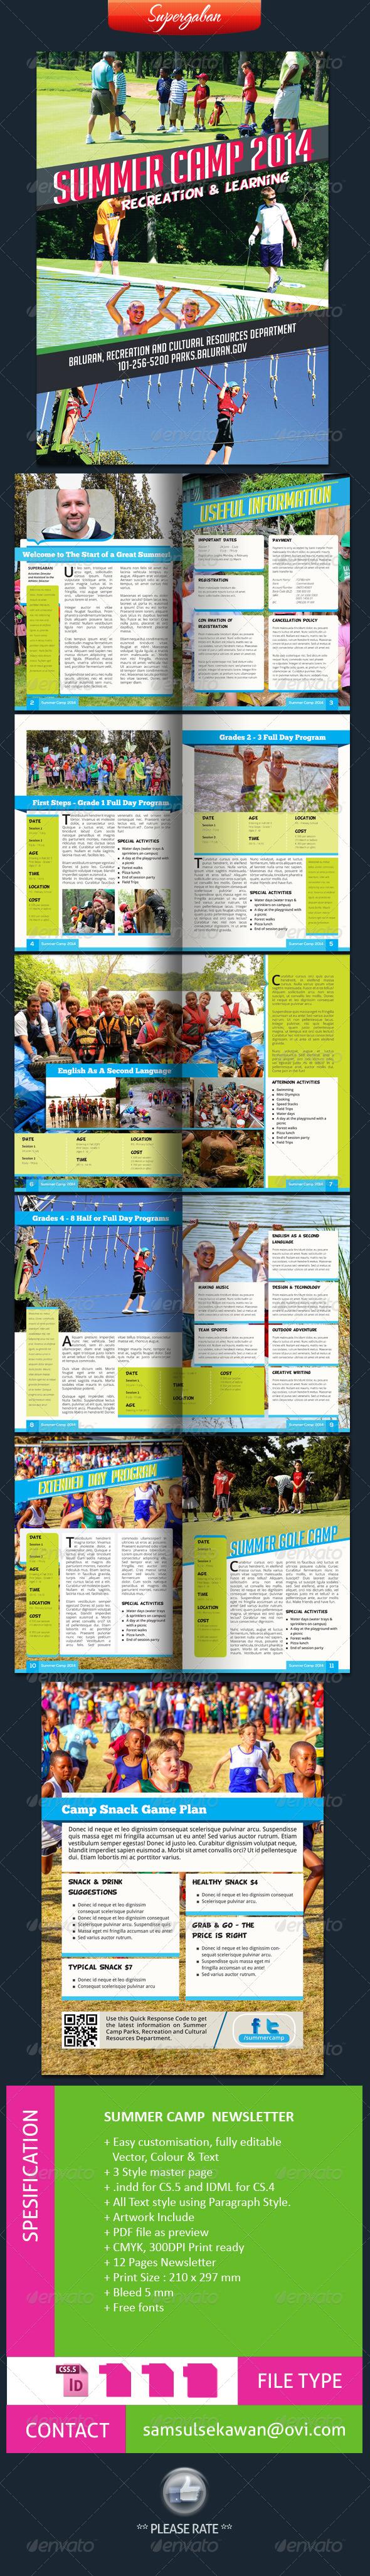 Summer Camps Newsletter